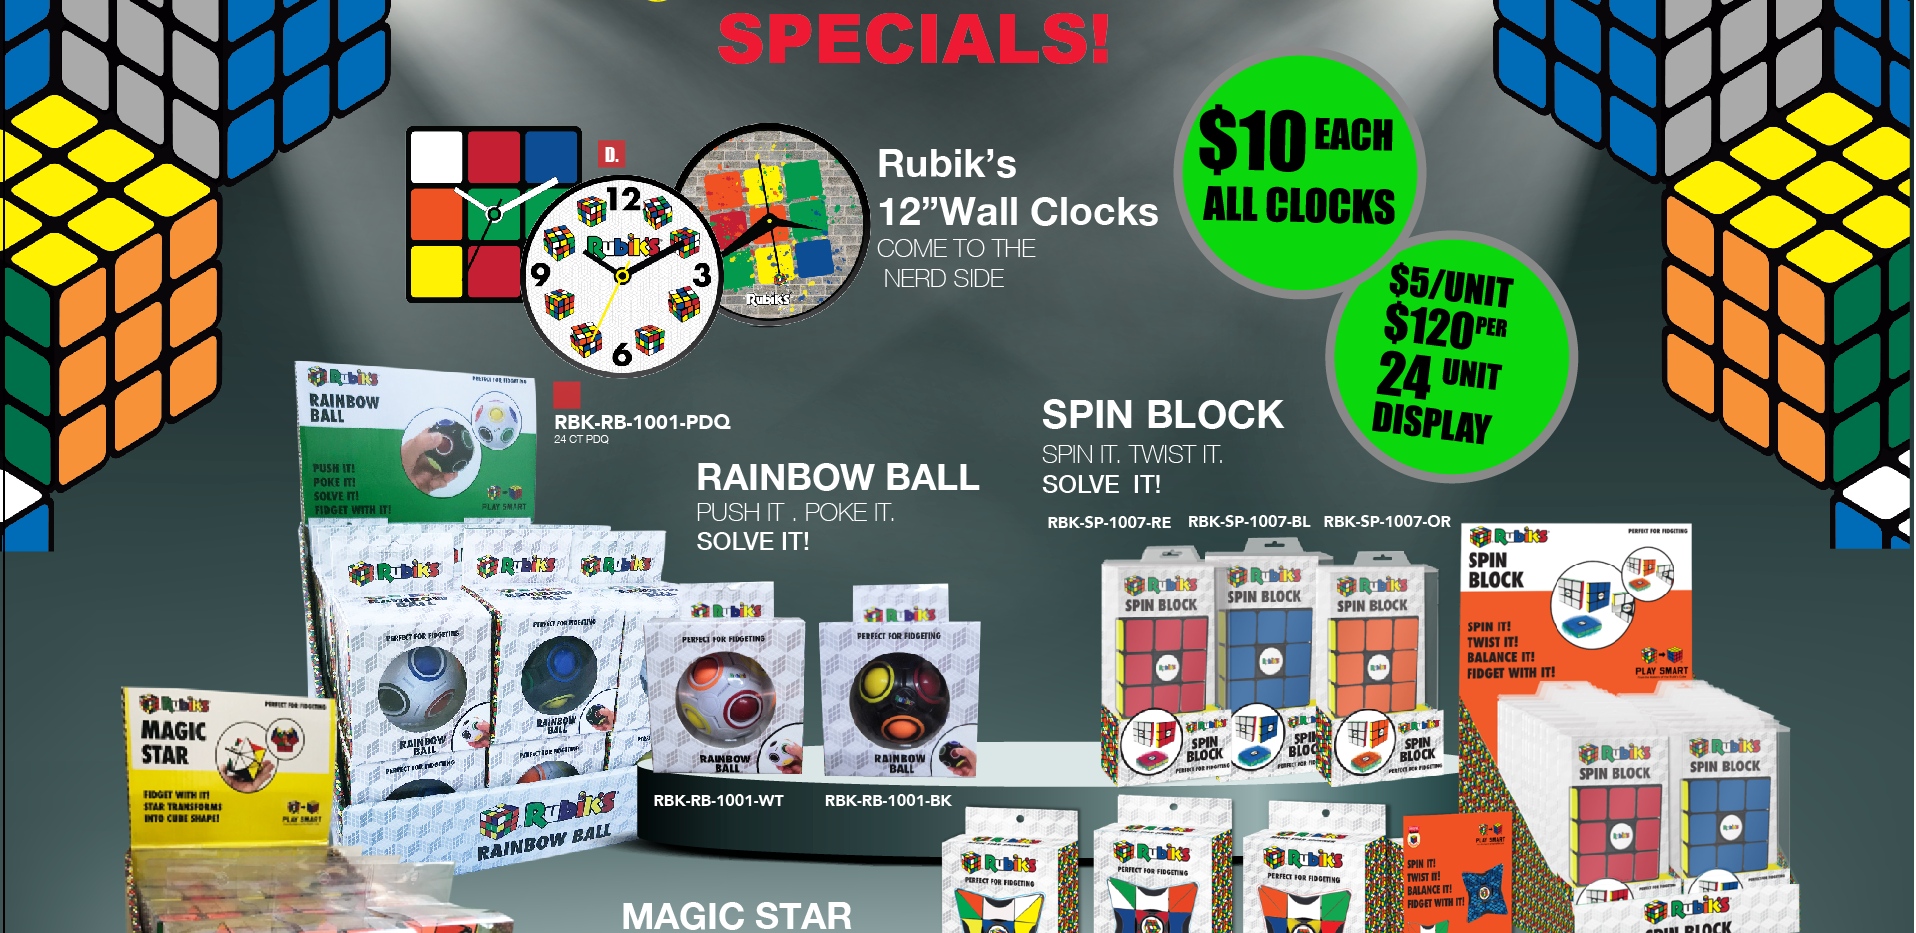 TOYZON | Rubiks Specials 2018